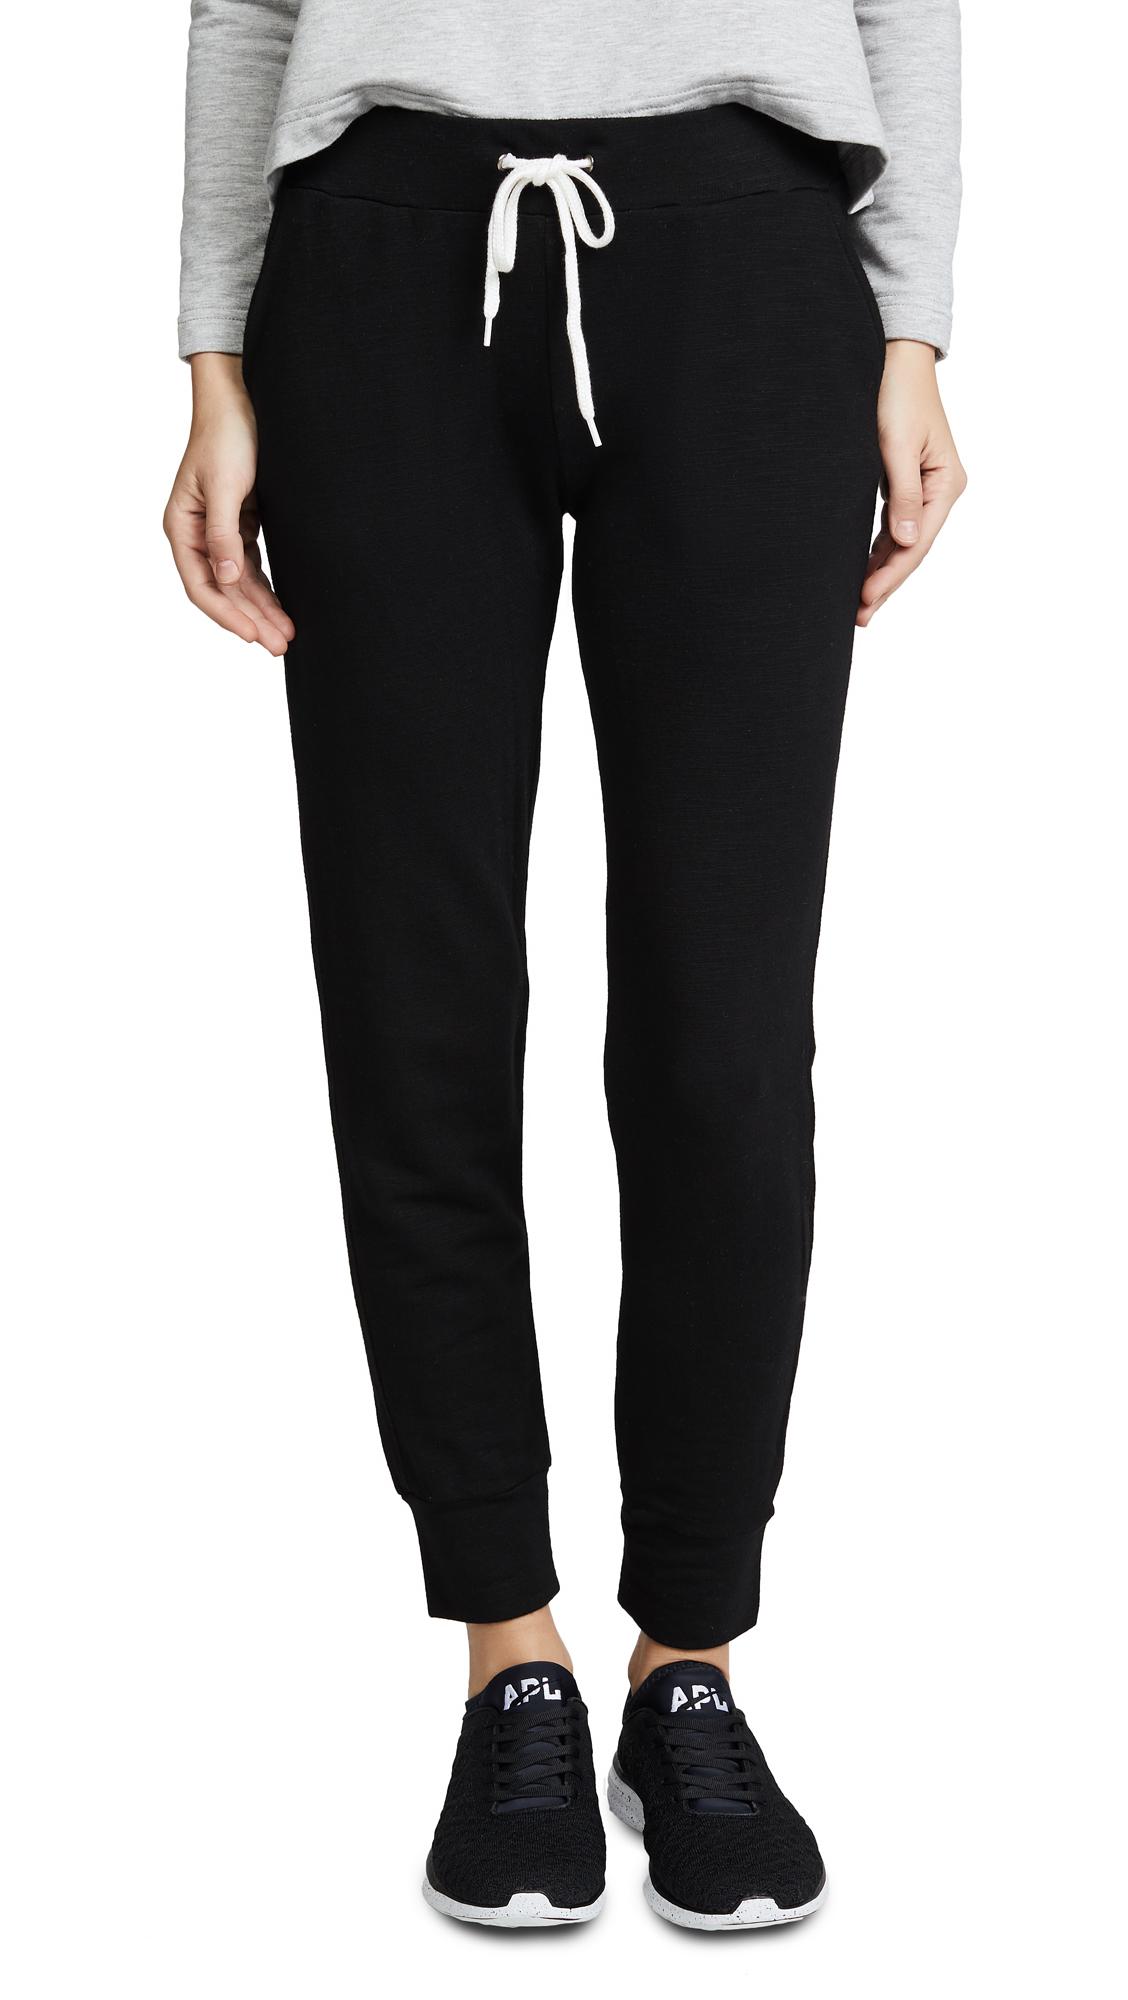 19c678c8d677 MONROW Sporty Sweatpants